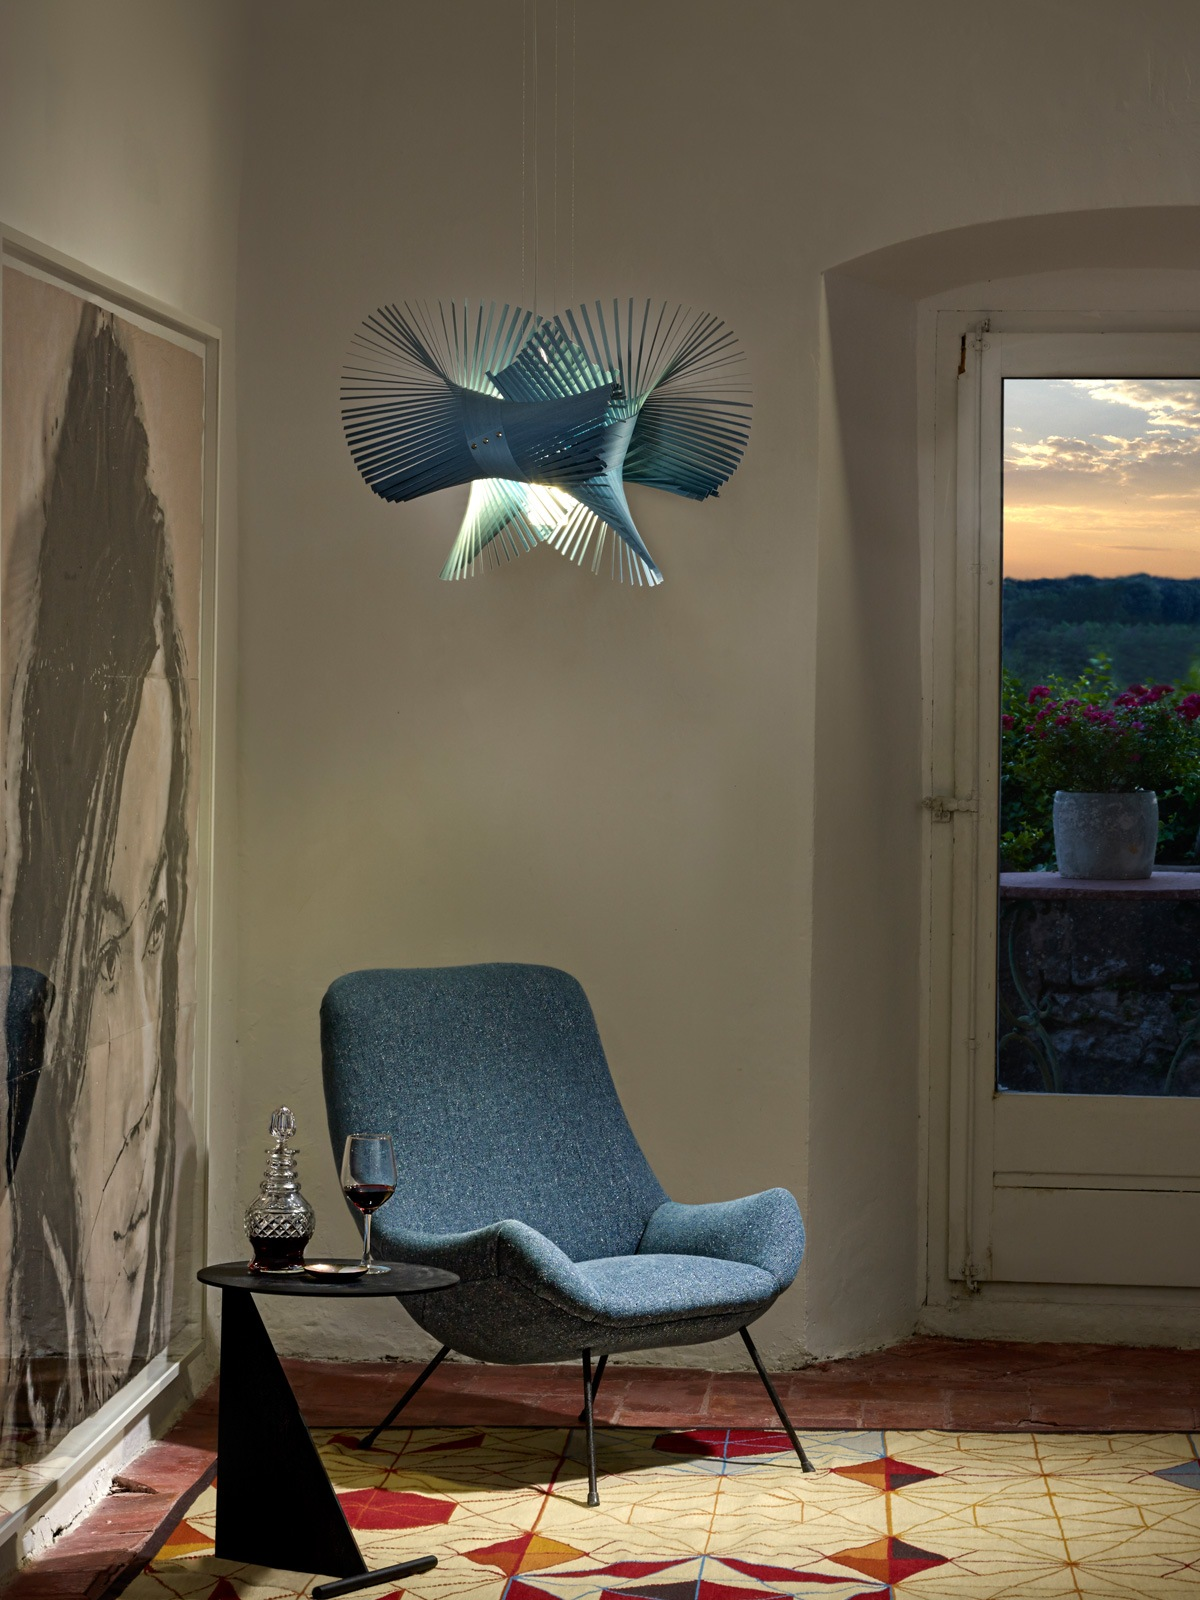 Minimakdo Holzleuchte LZF Lamps Designerleuchte DesignOrt Lampen Berlin